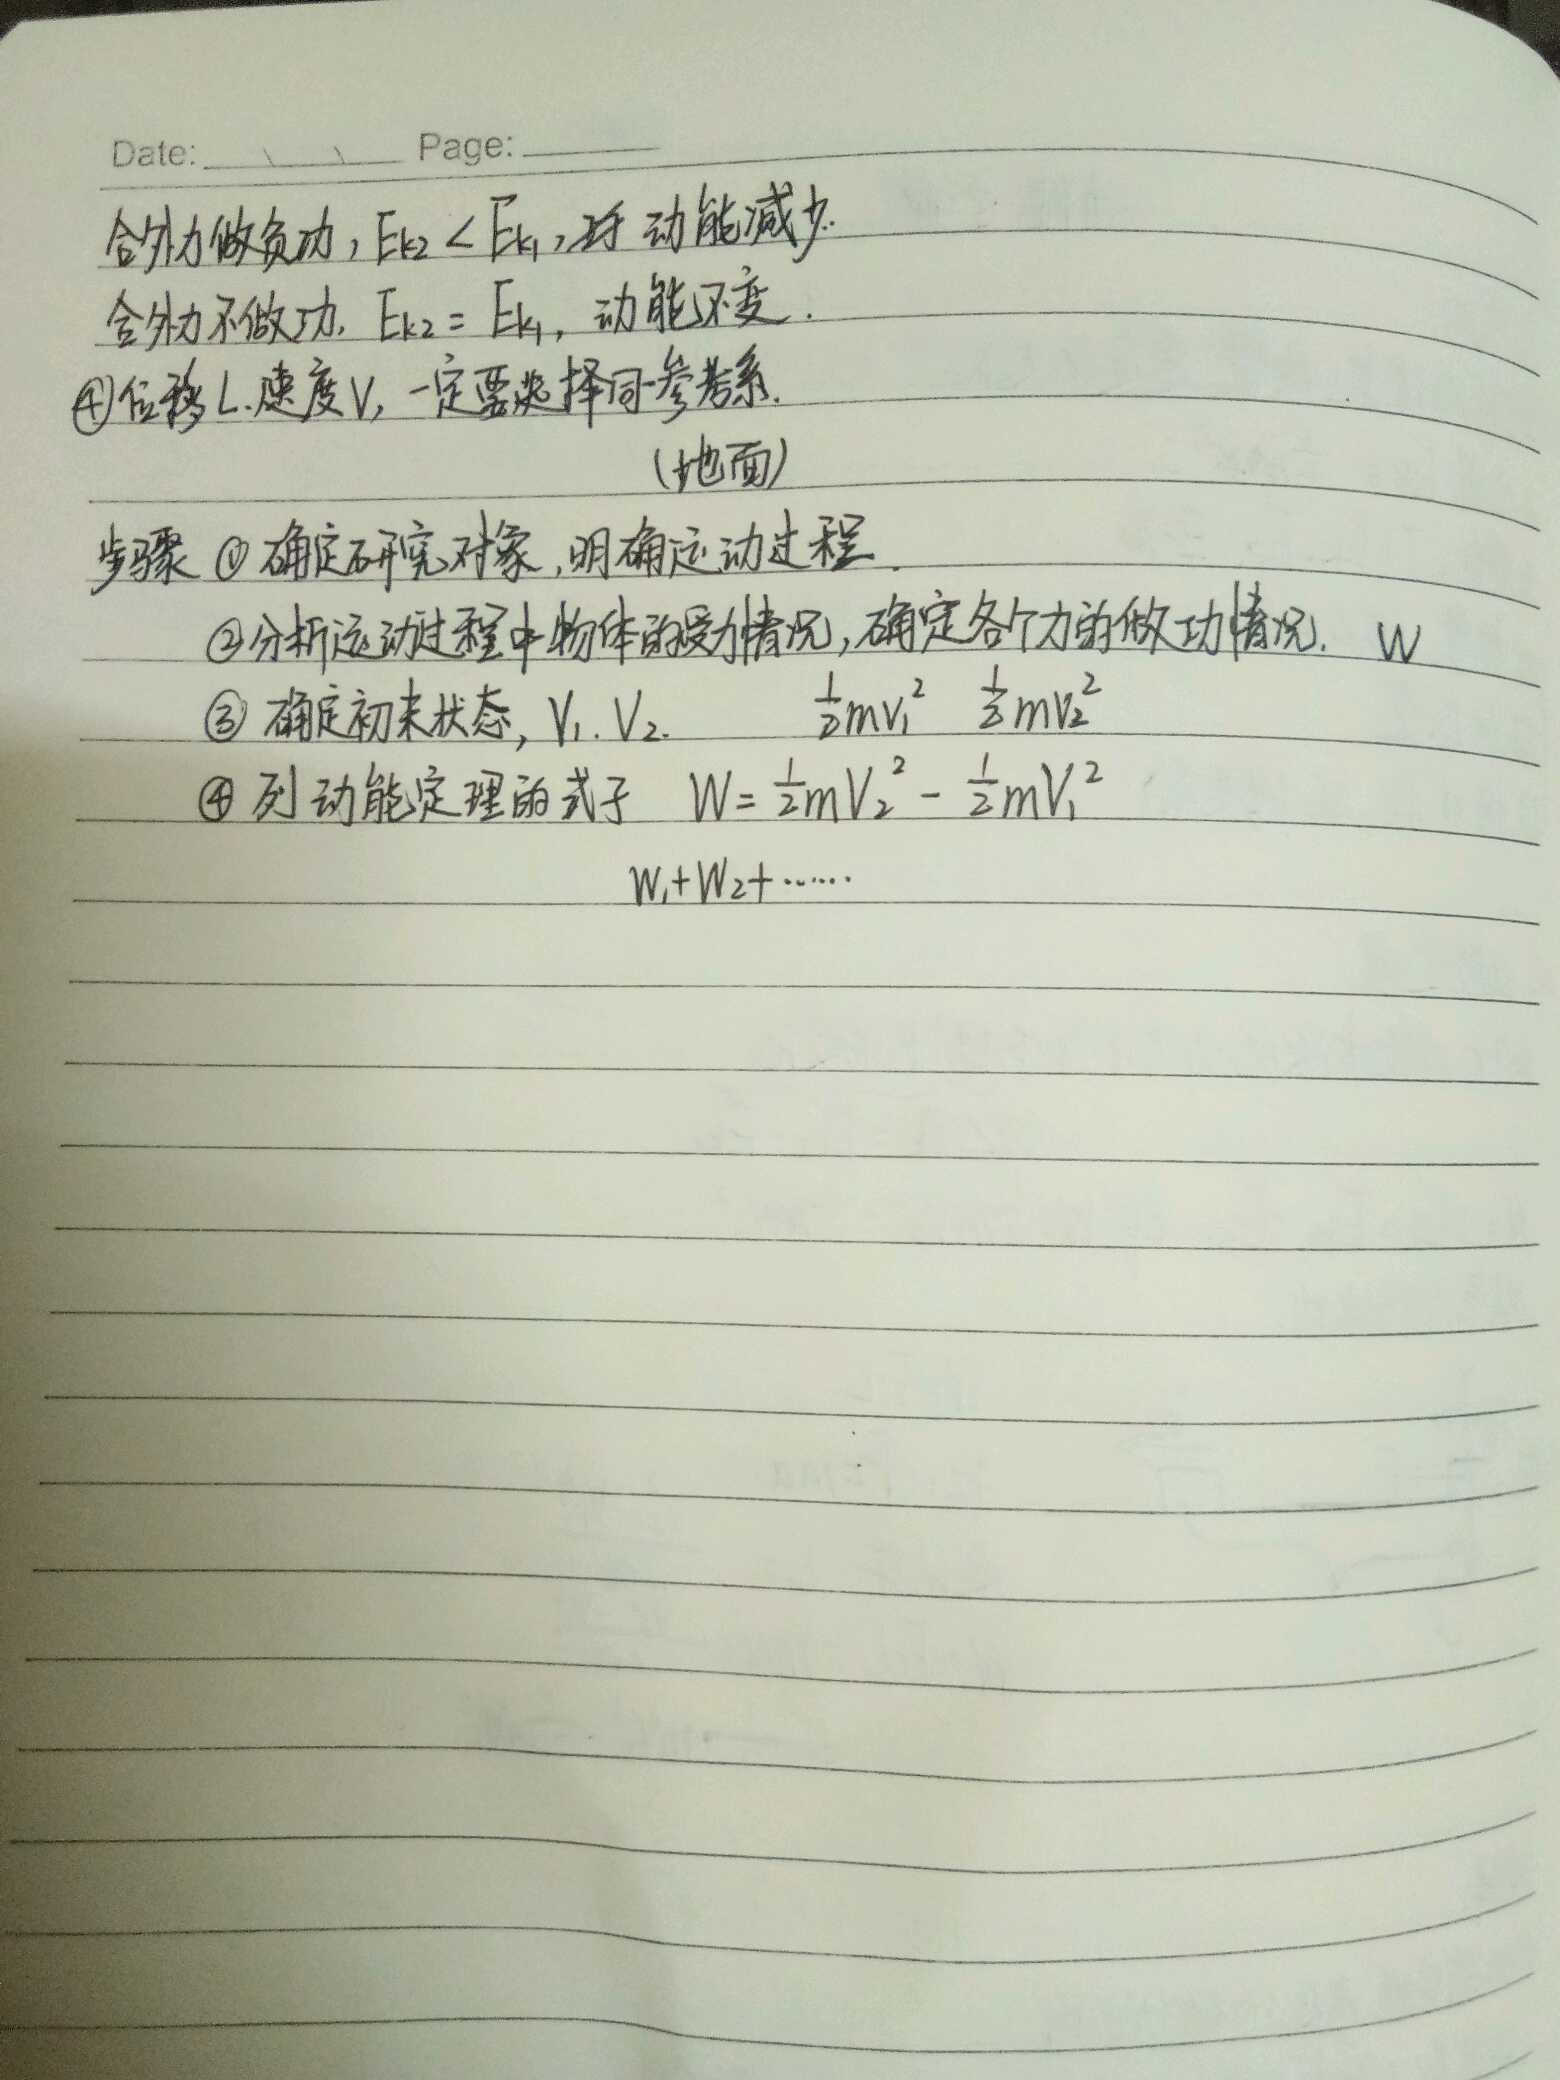 multi_image_20180407_224853.jpg